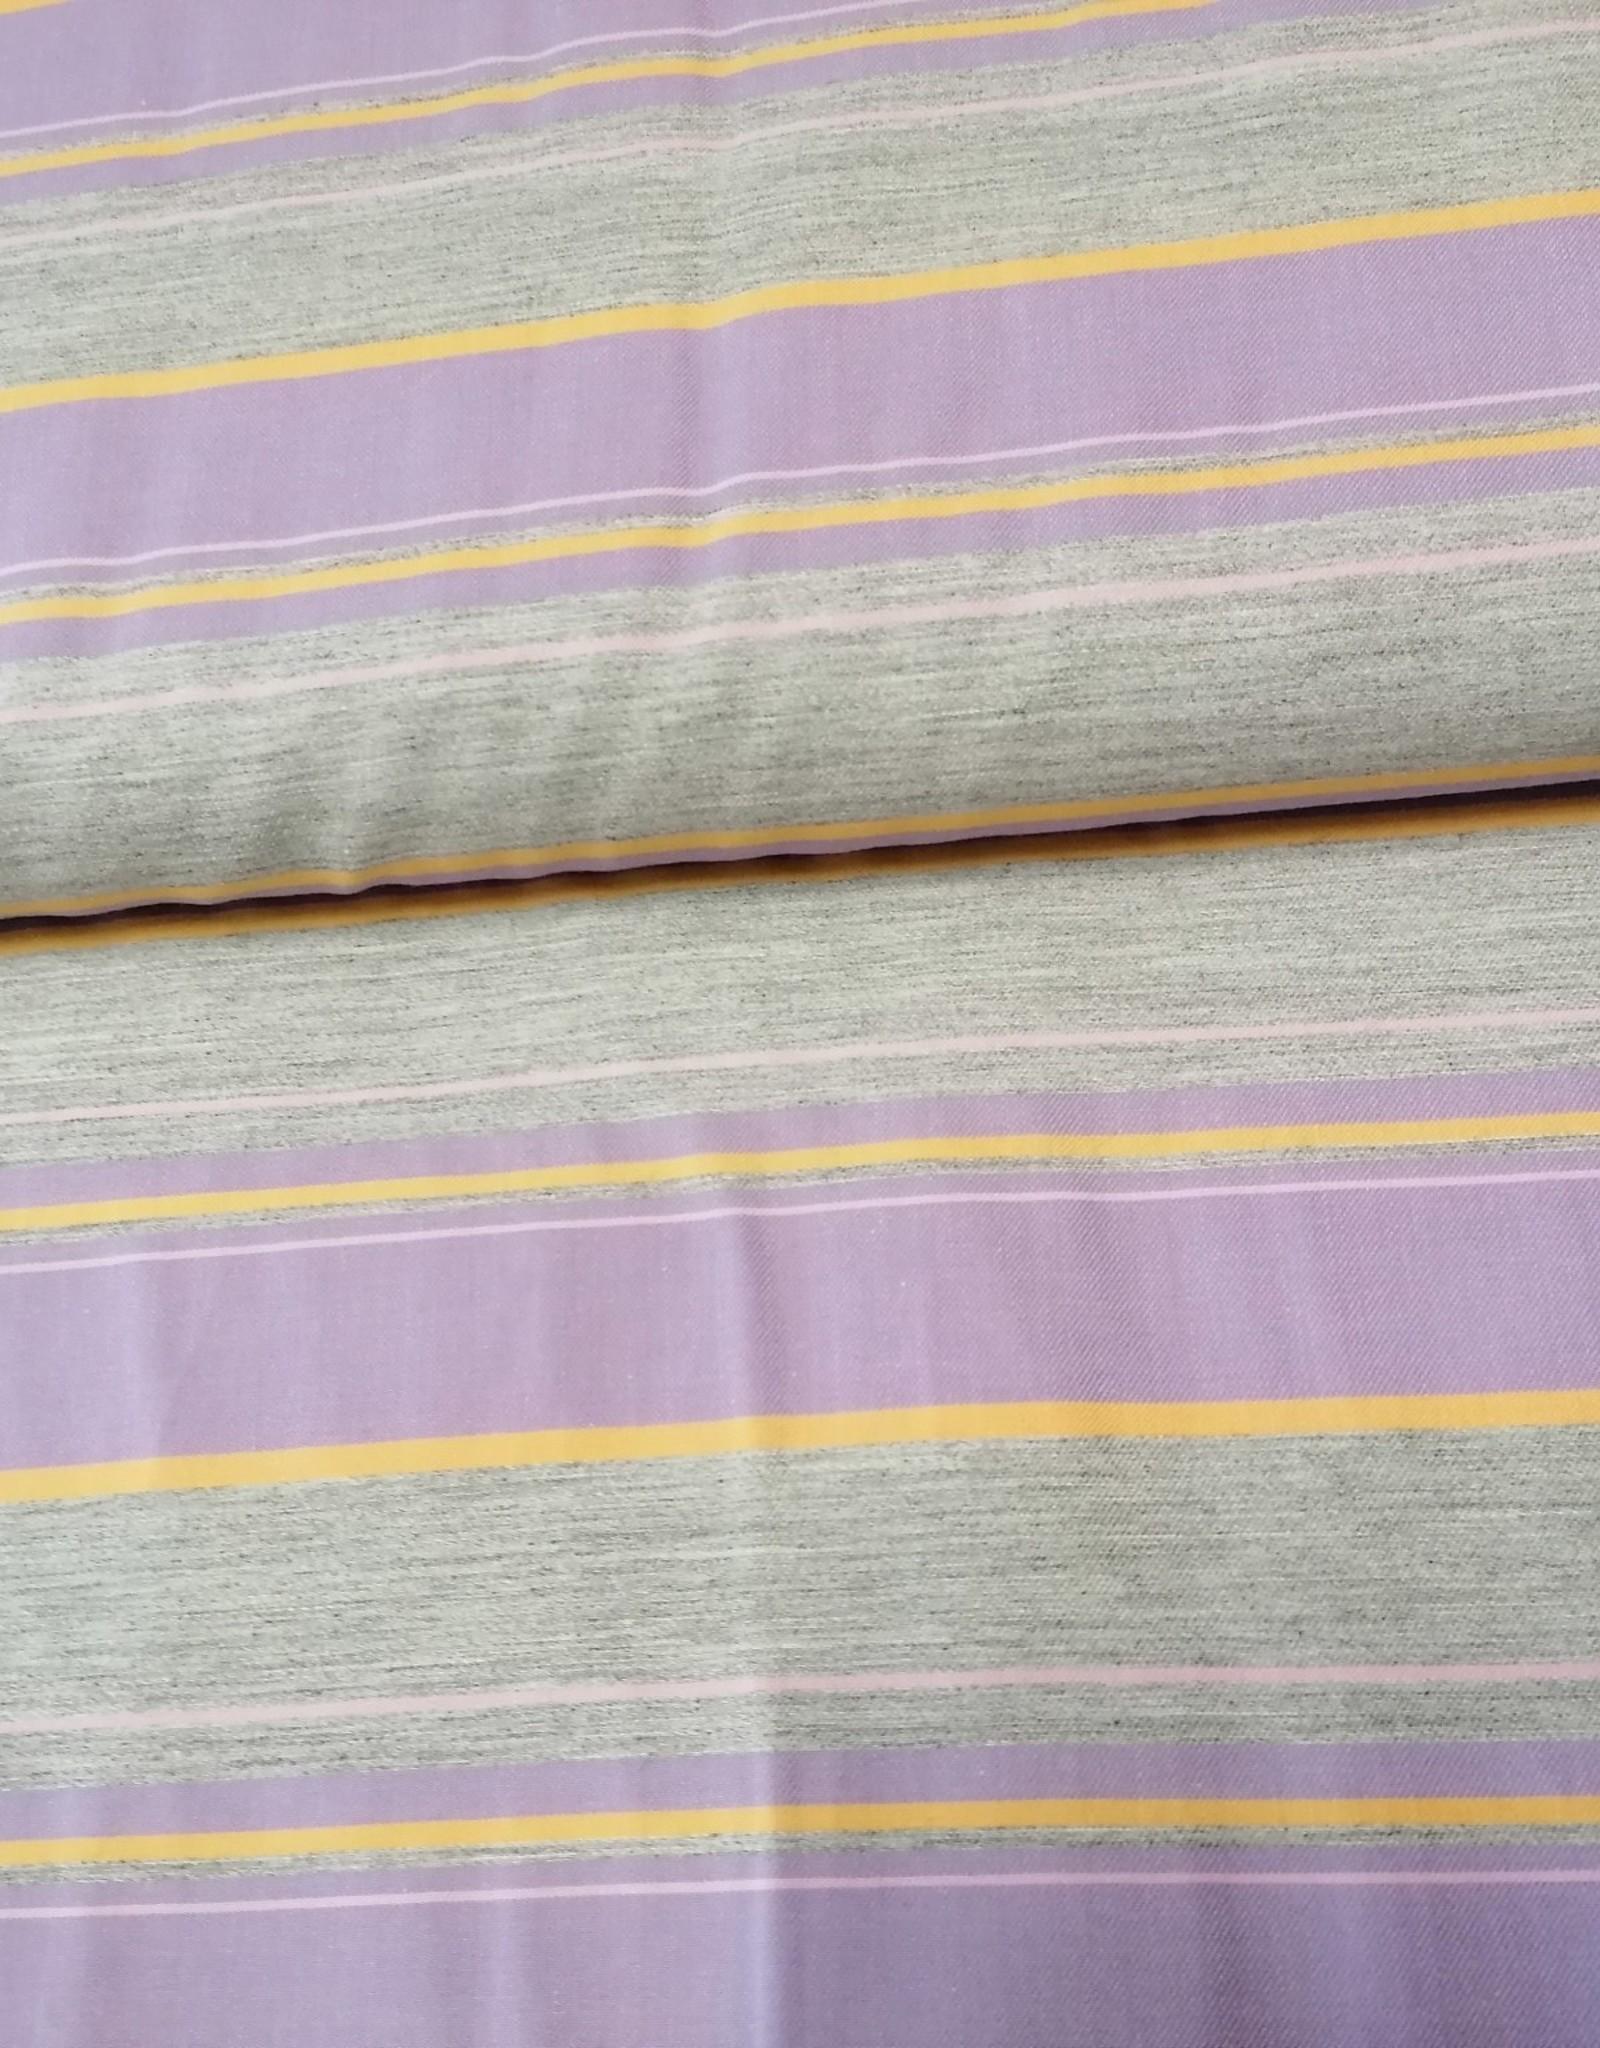 Editex Fabrics Editex Signature soepel paars/grijze/oranje strepen